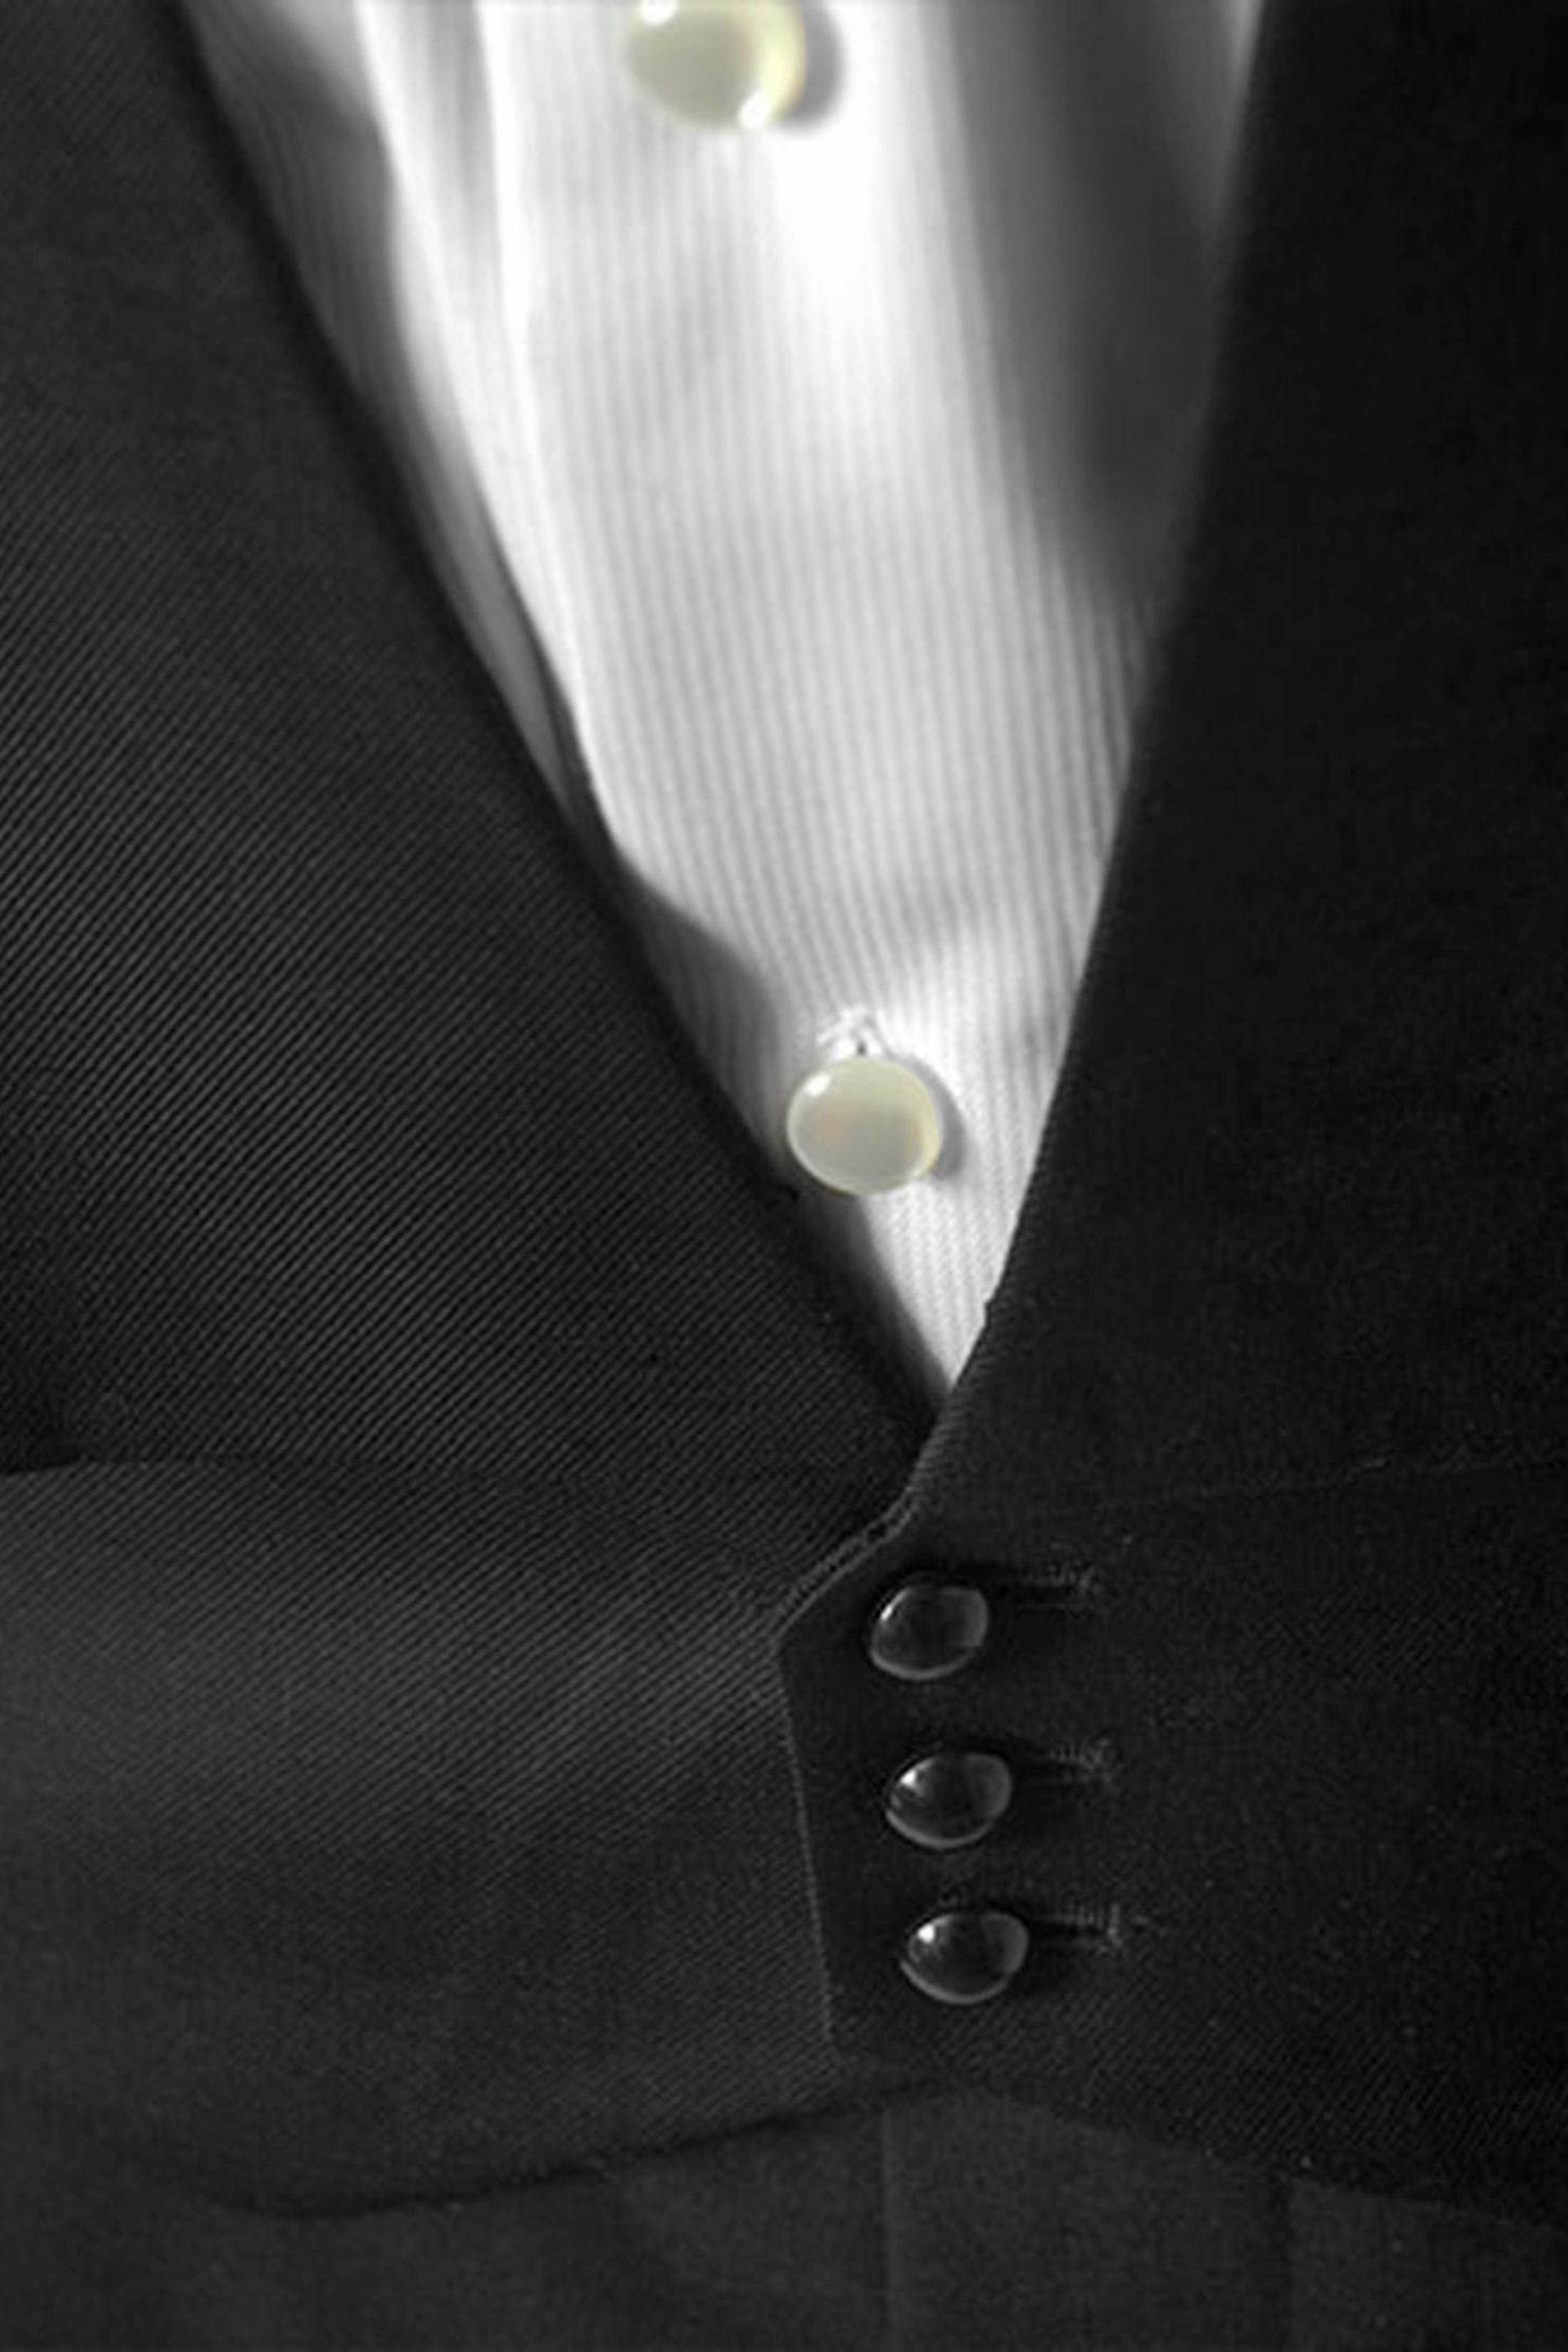 Tailcoat + Accessories